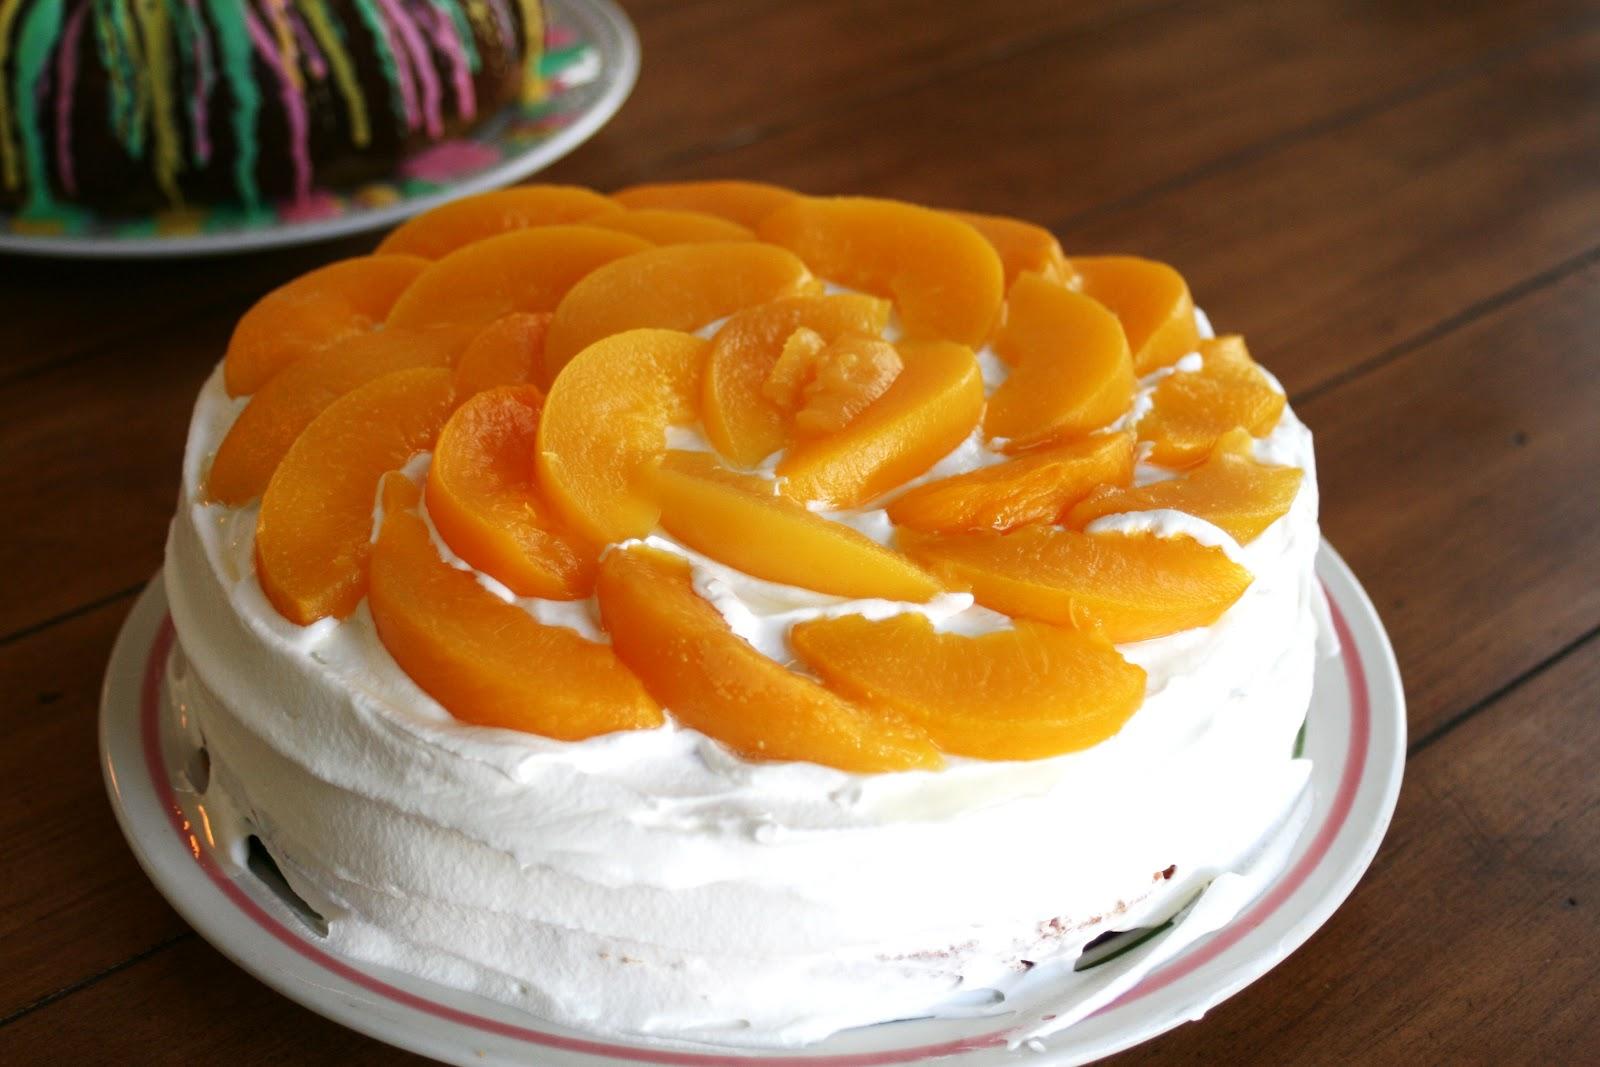 cake peaches n cream melba bundt peaches cream bundt cake and peaches ...